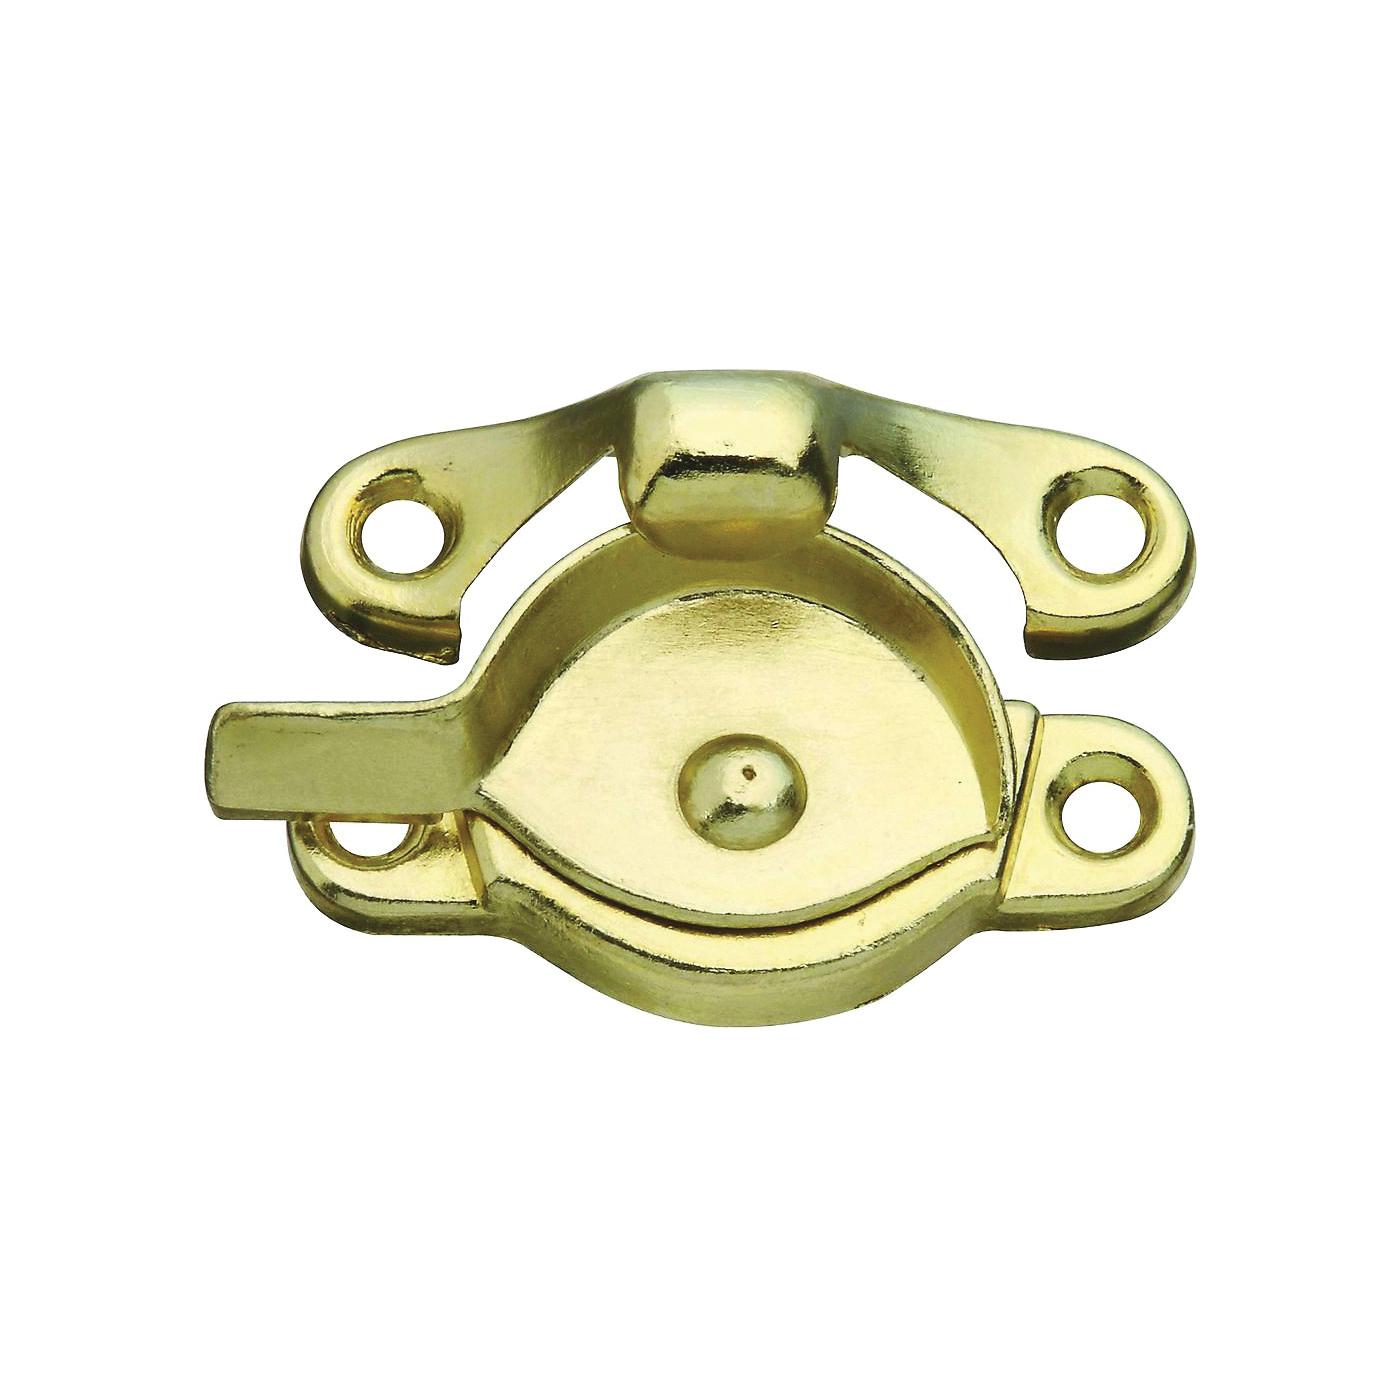 Picture of National Hardware SPB600 Series N171-546 Sash Lock, Zinc, Antique Brass